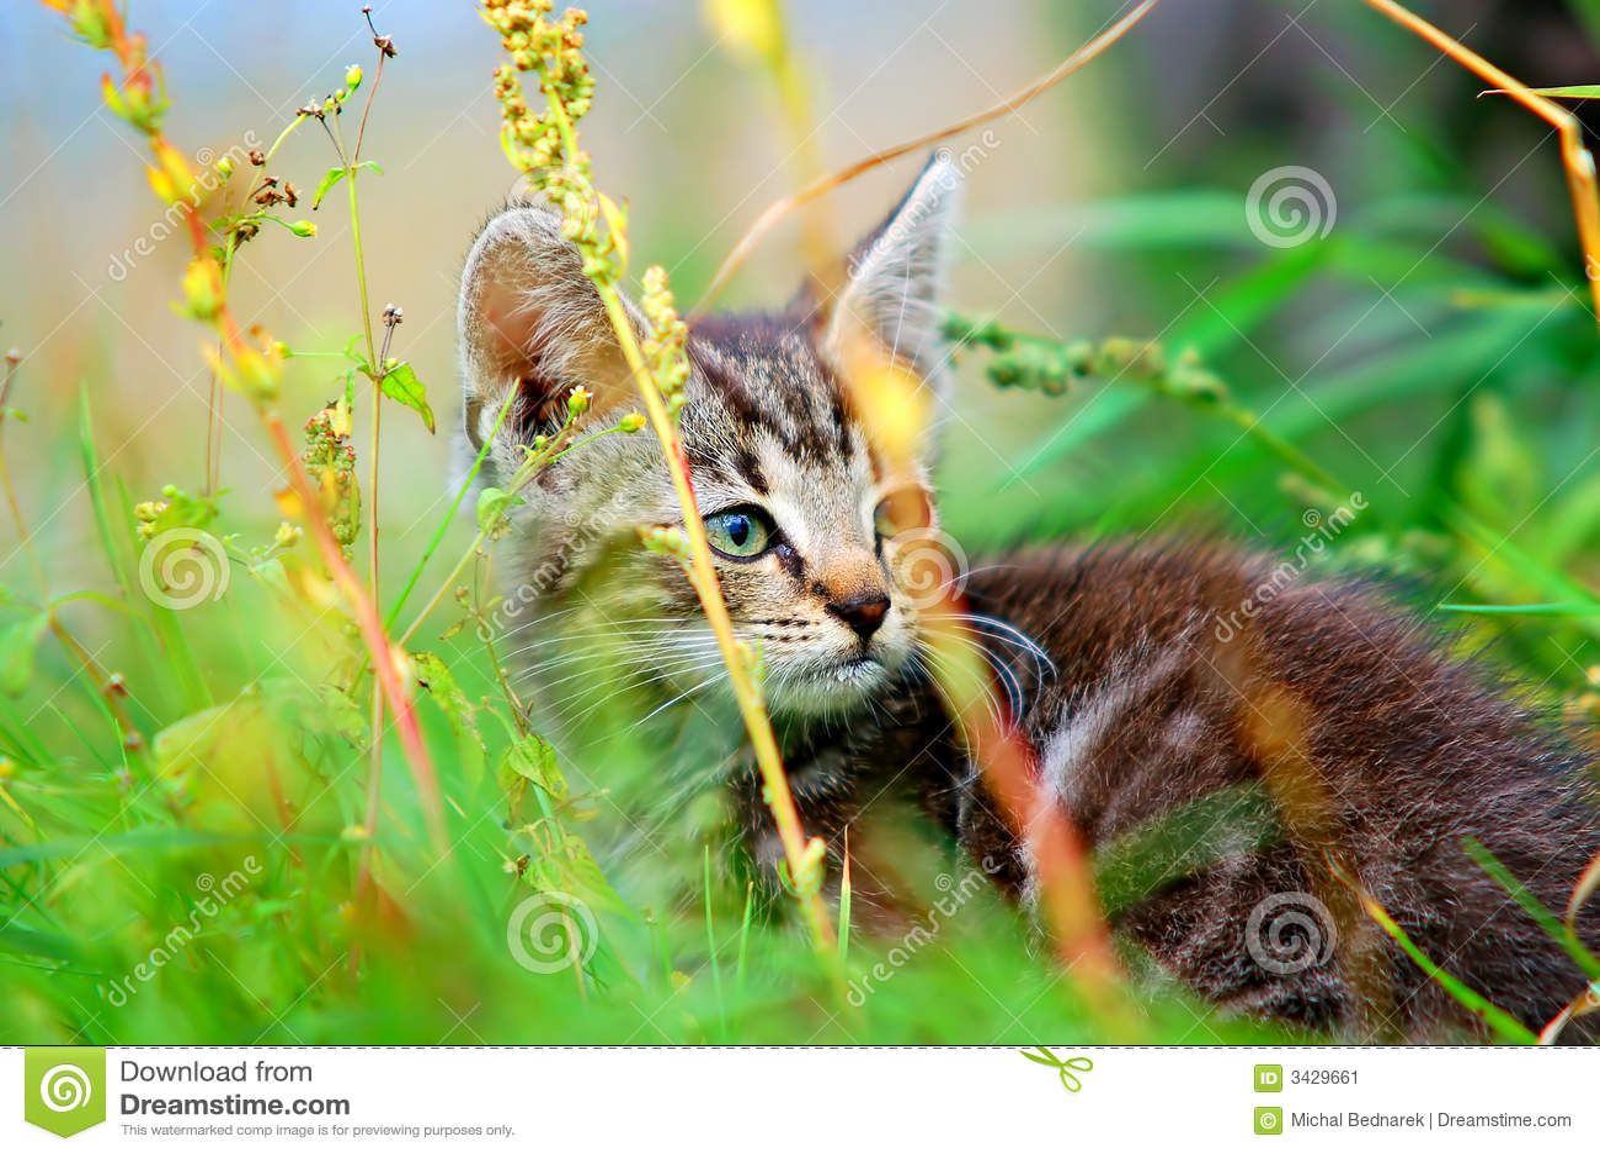 Kotek trawy